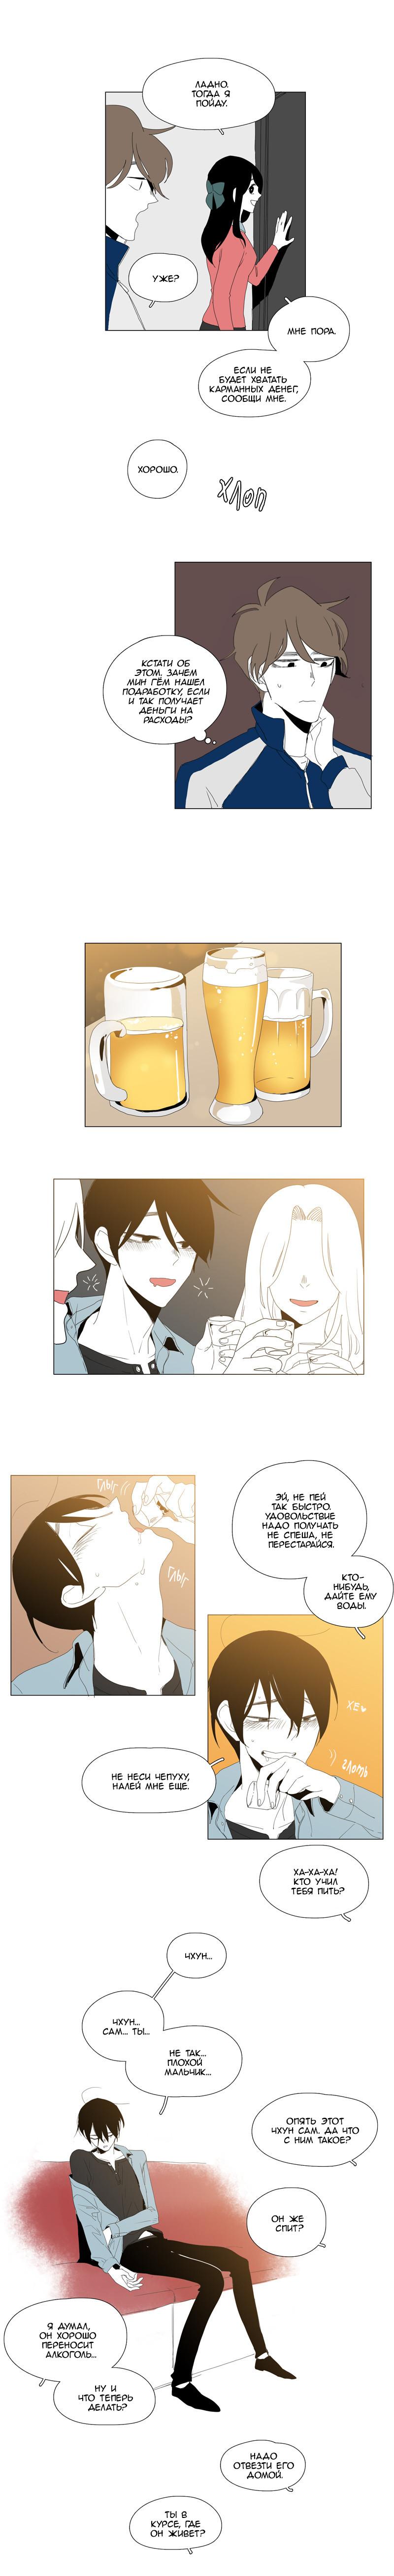 https://r1.ninemanga.com/comics/pic2/33/27873/333362/1504714626441.jpg Page 6